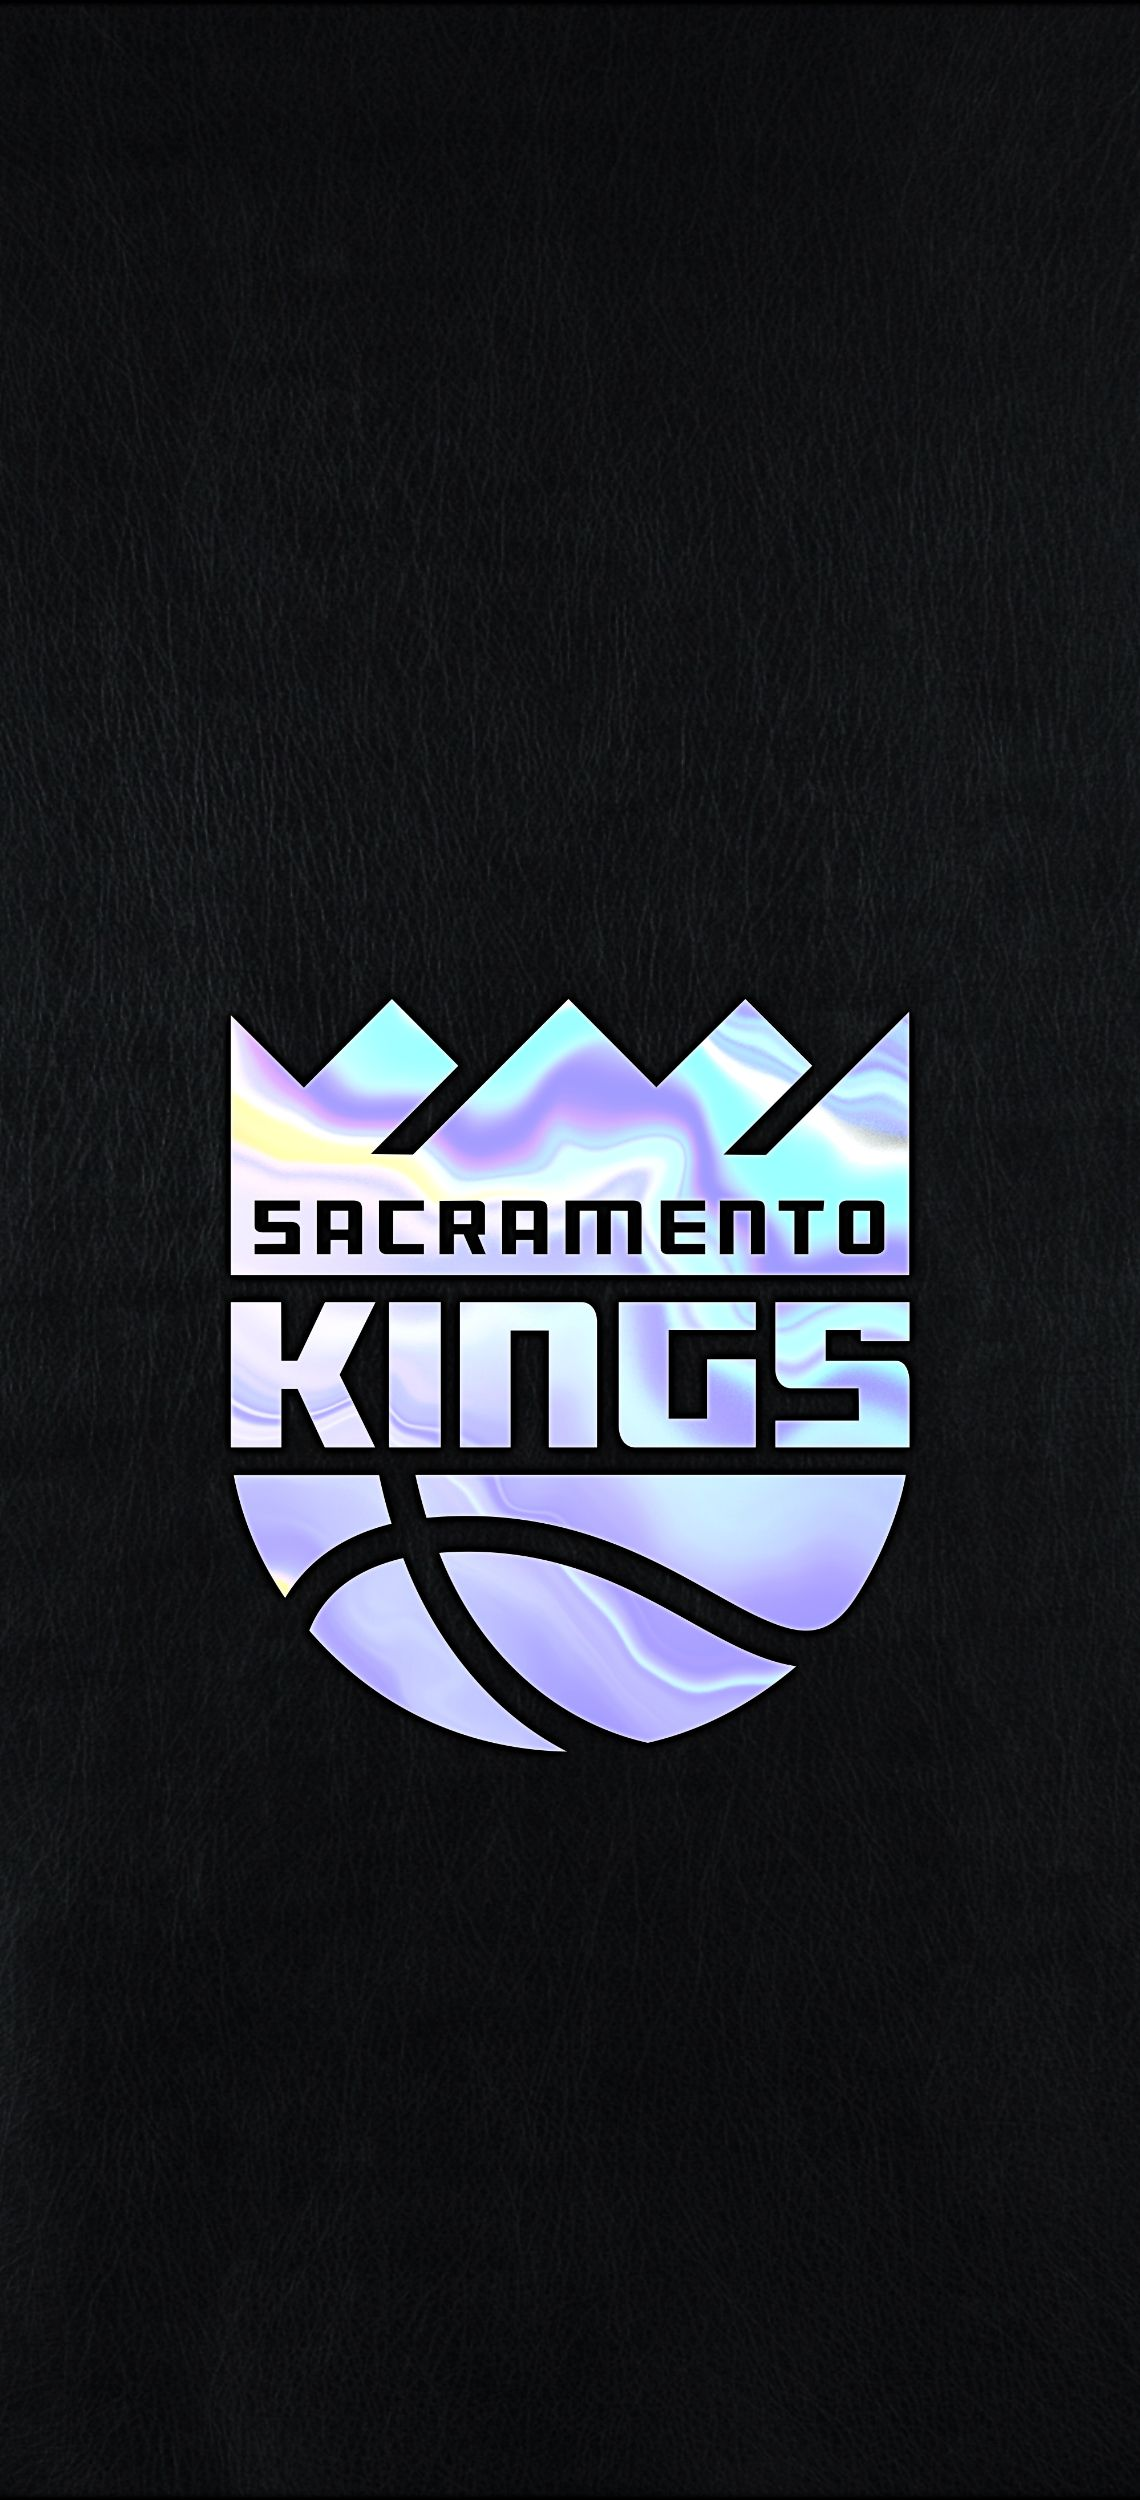 Nba Basketball Team Sacramento Kings Phone Background Sacramento Kings Nba Basketball Teams Sacramento